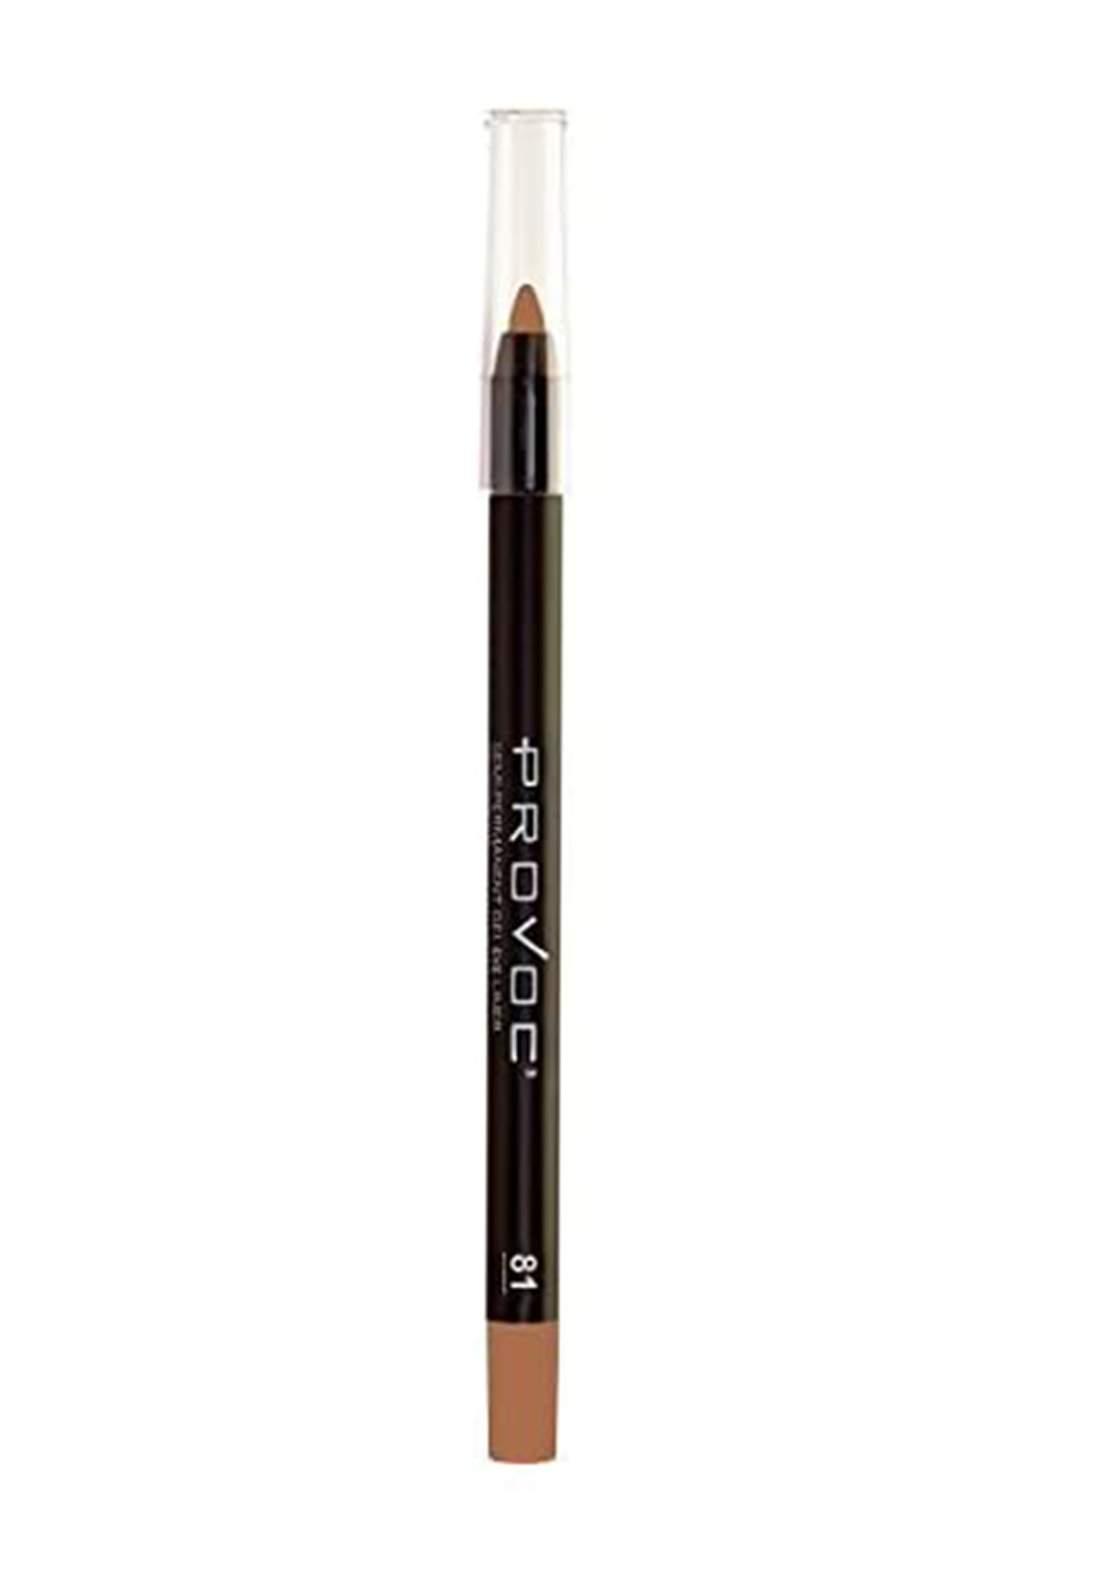 Provoc 353-0014 Semi-Permanent Gel Eyeliner pencil  No.81 Gilded Glamour قلم تحديد العيون